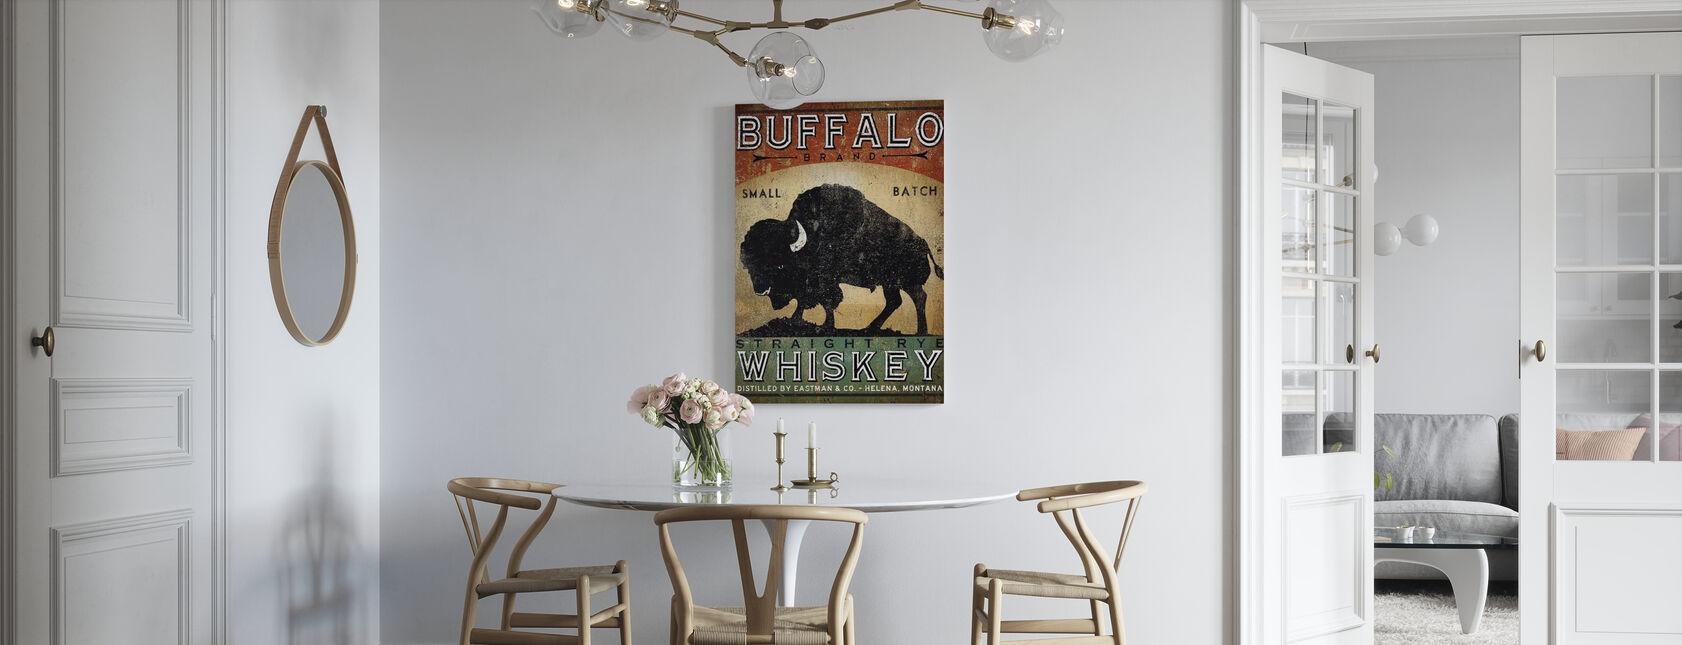 Buffalo viski - Canvastaulu - Keittiö